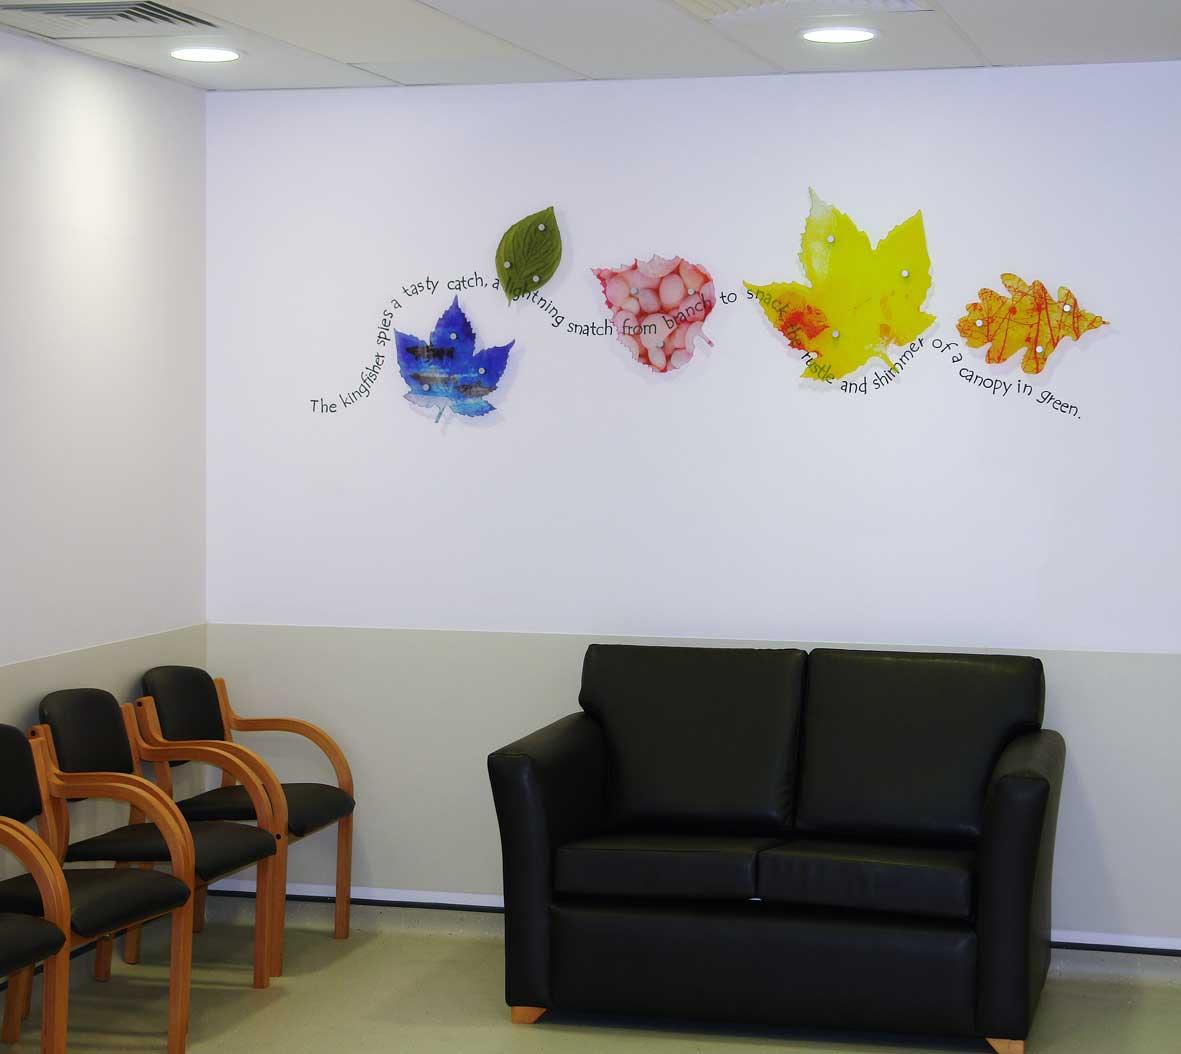 Hospital artwork